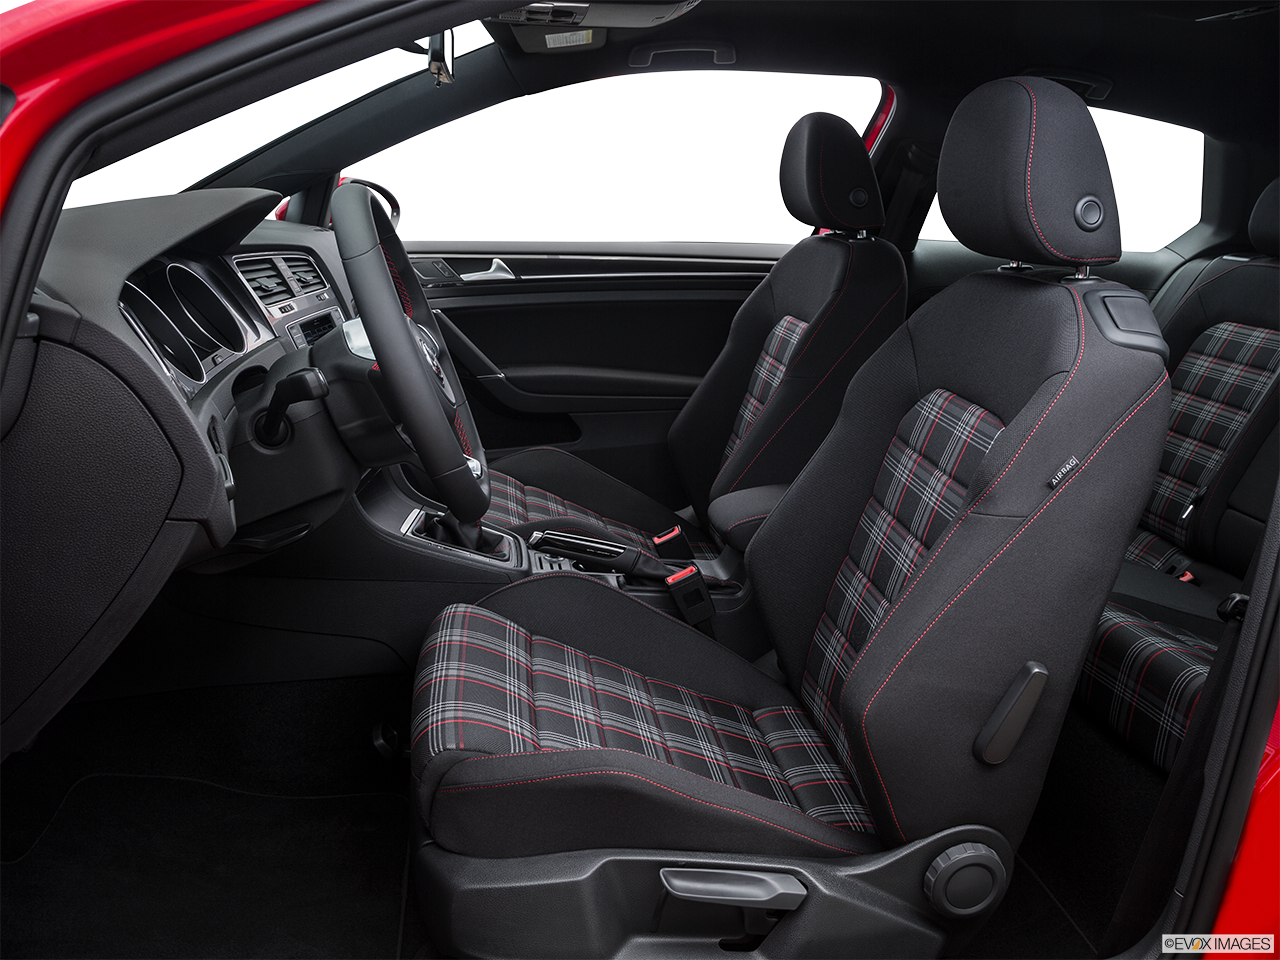 Research The 2016 Volkswagen Golf GTI in Newport News